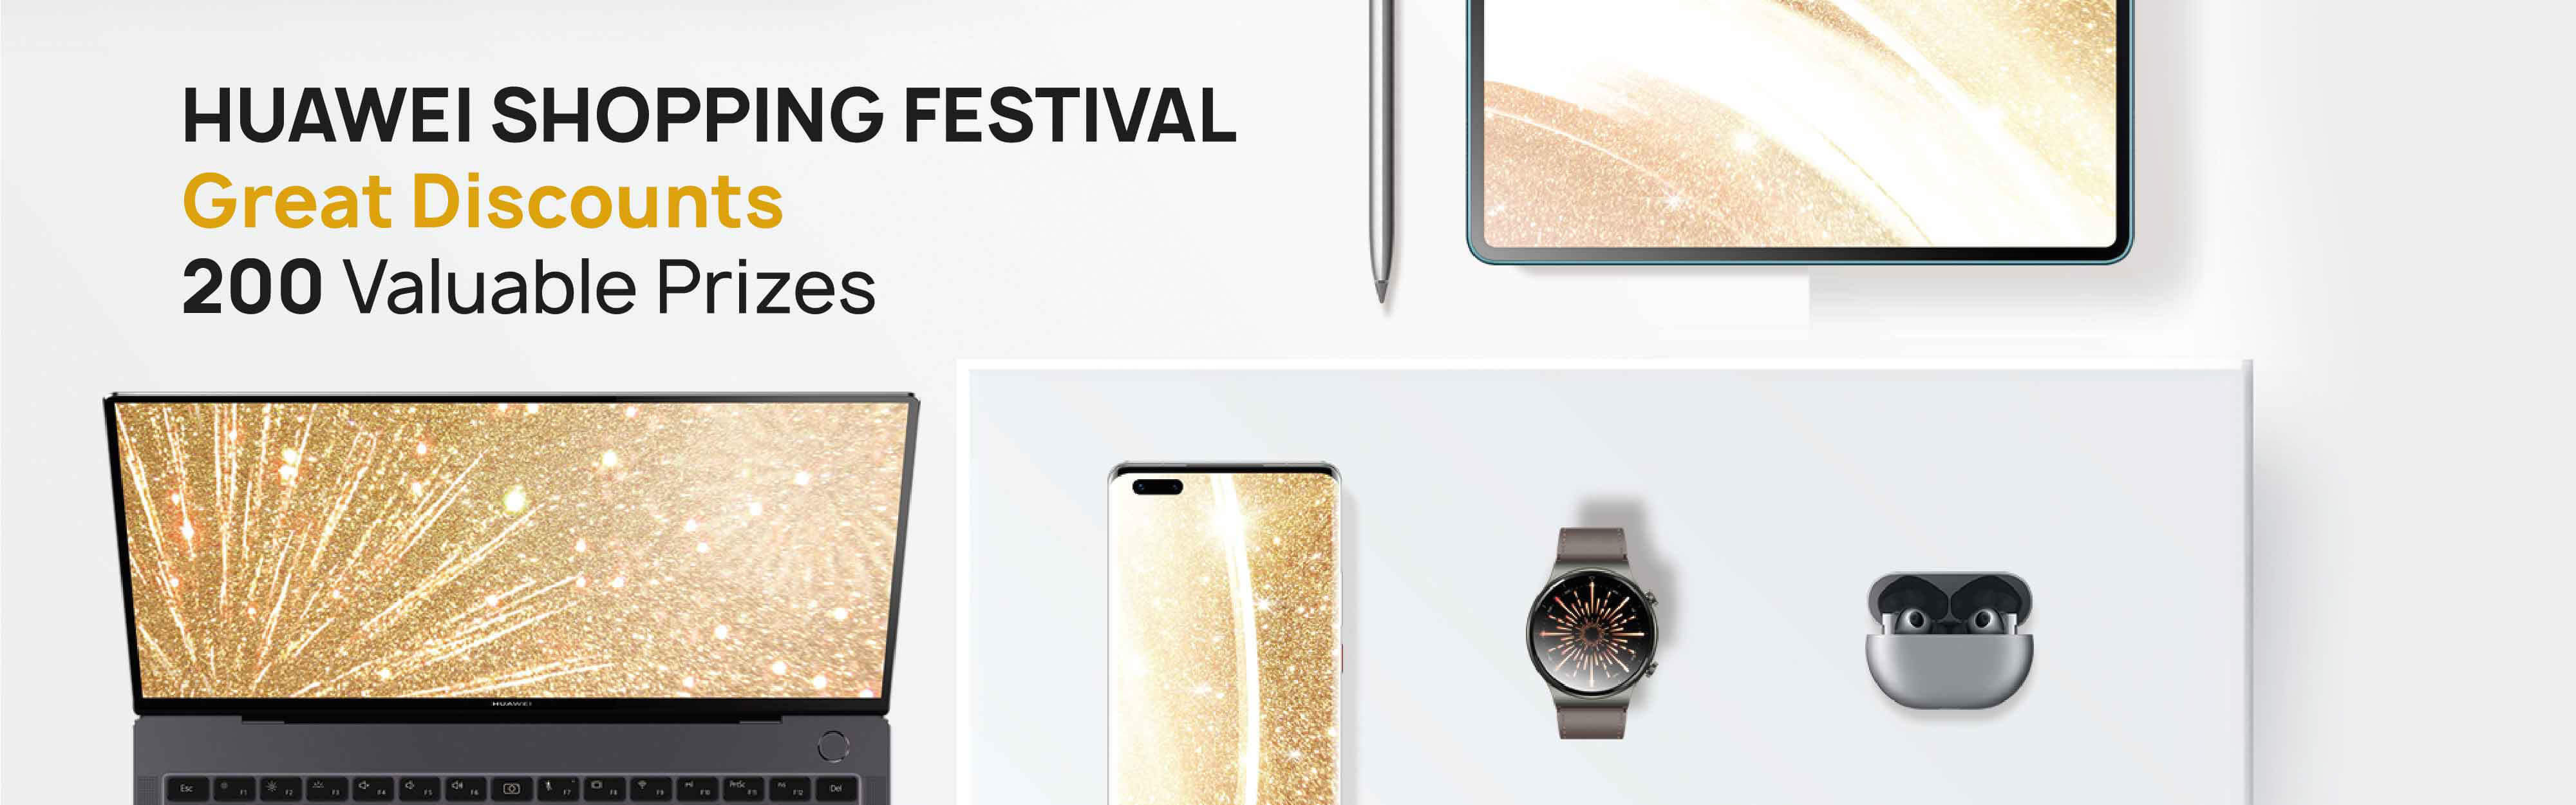 Huawei Festival